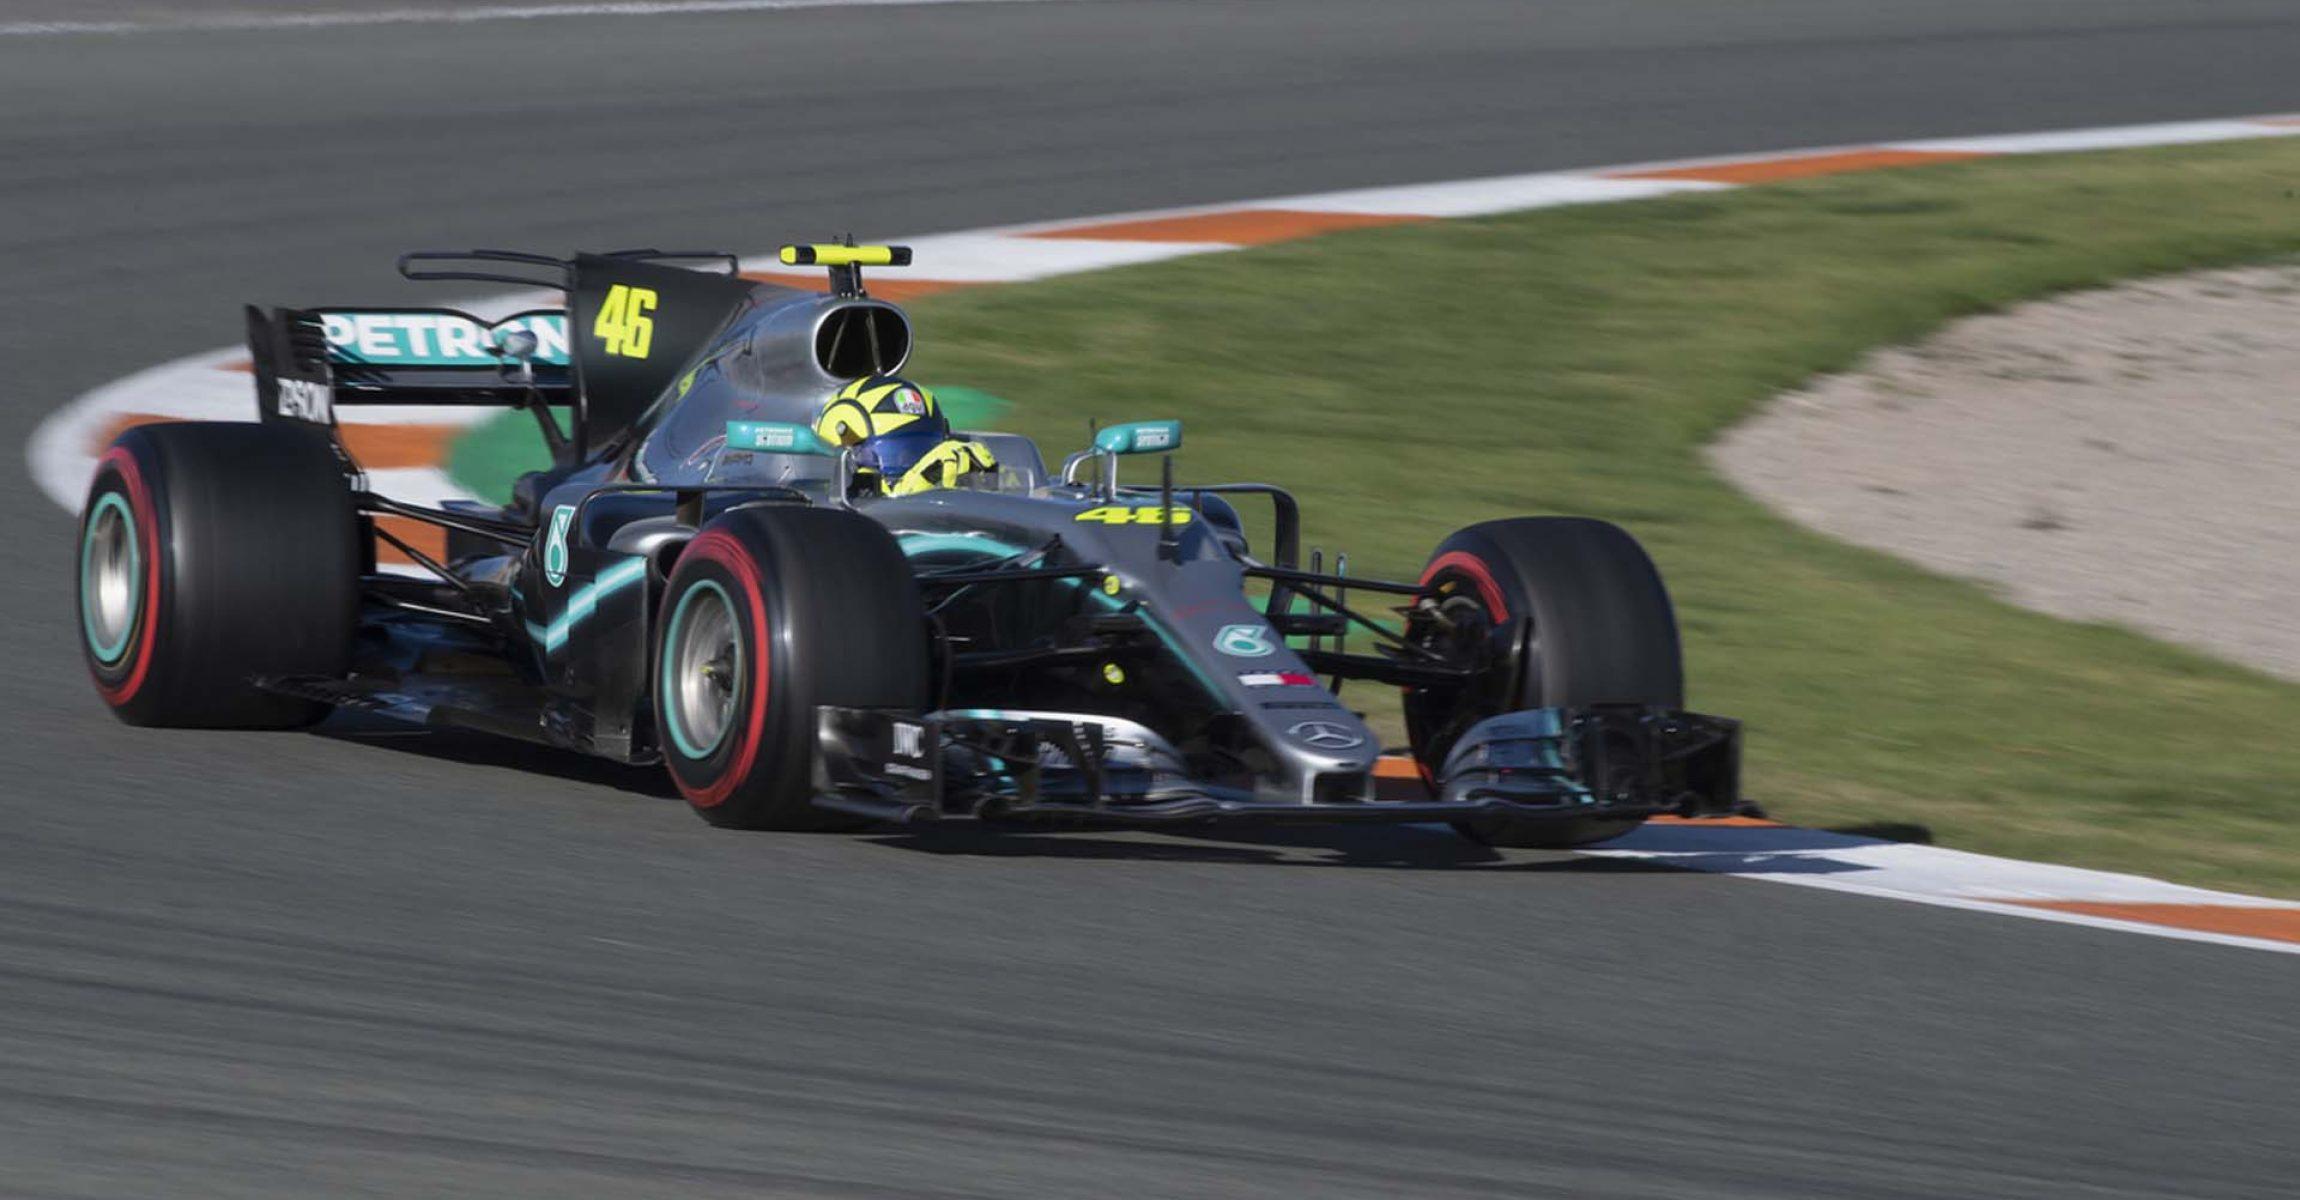 Valentino Rossi, Mercedes